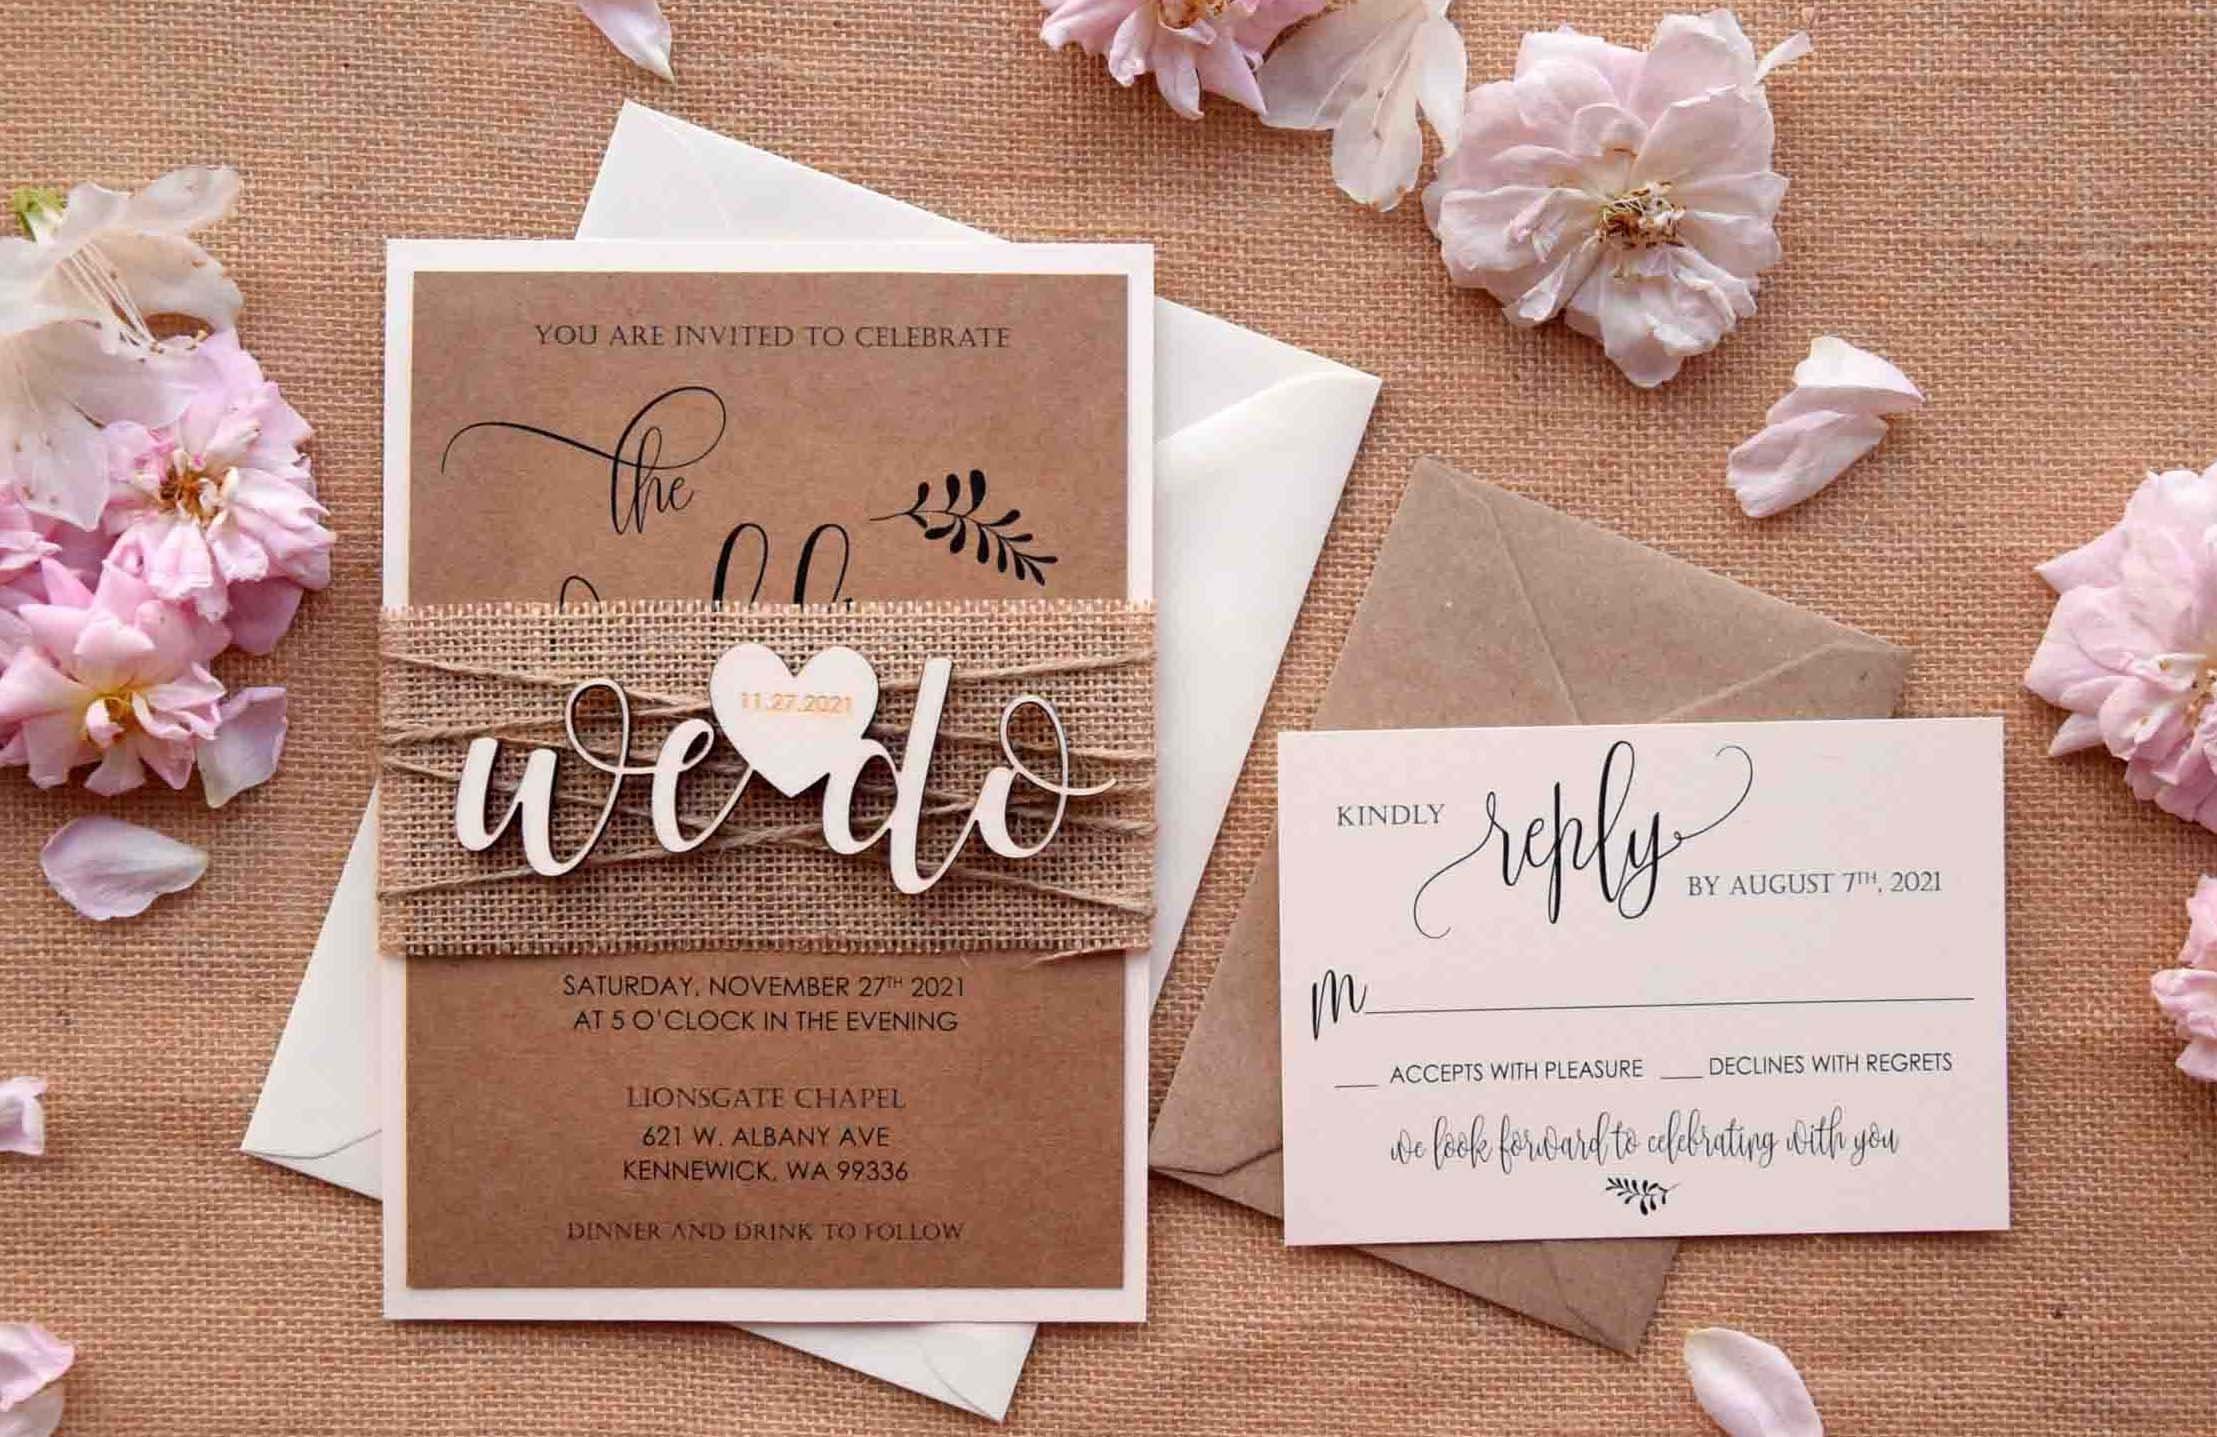 7426d79e9aa35 We Do Rustic Wedding Invitations, Custom Wooden Wedding Invitations,  Personalized Rustic Wedding Invites, Rustic Laser Cut Wedding Invites